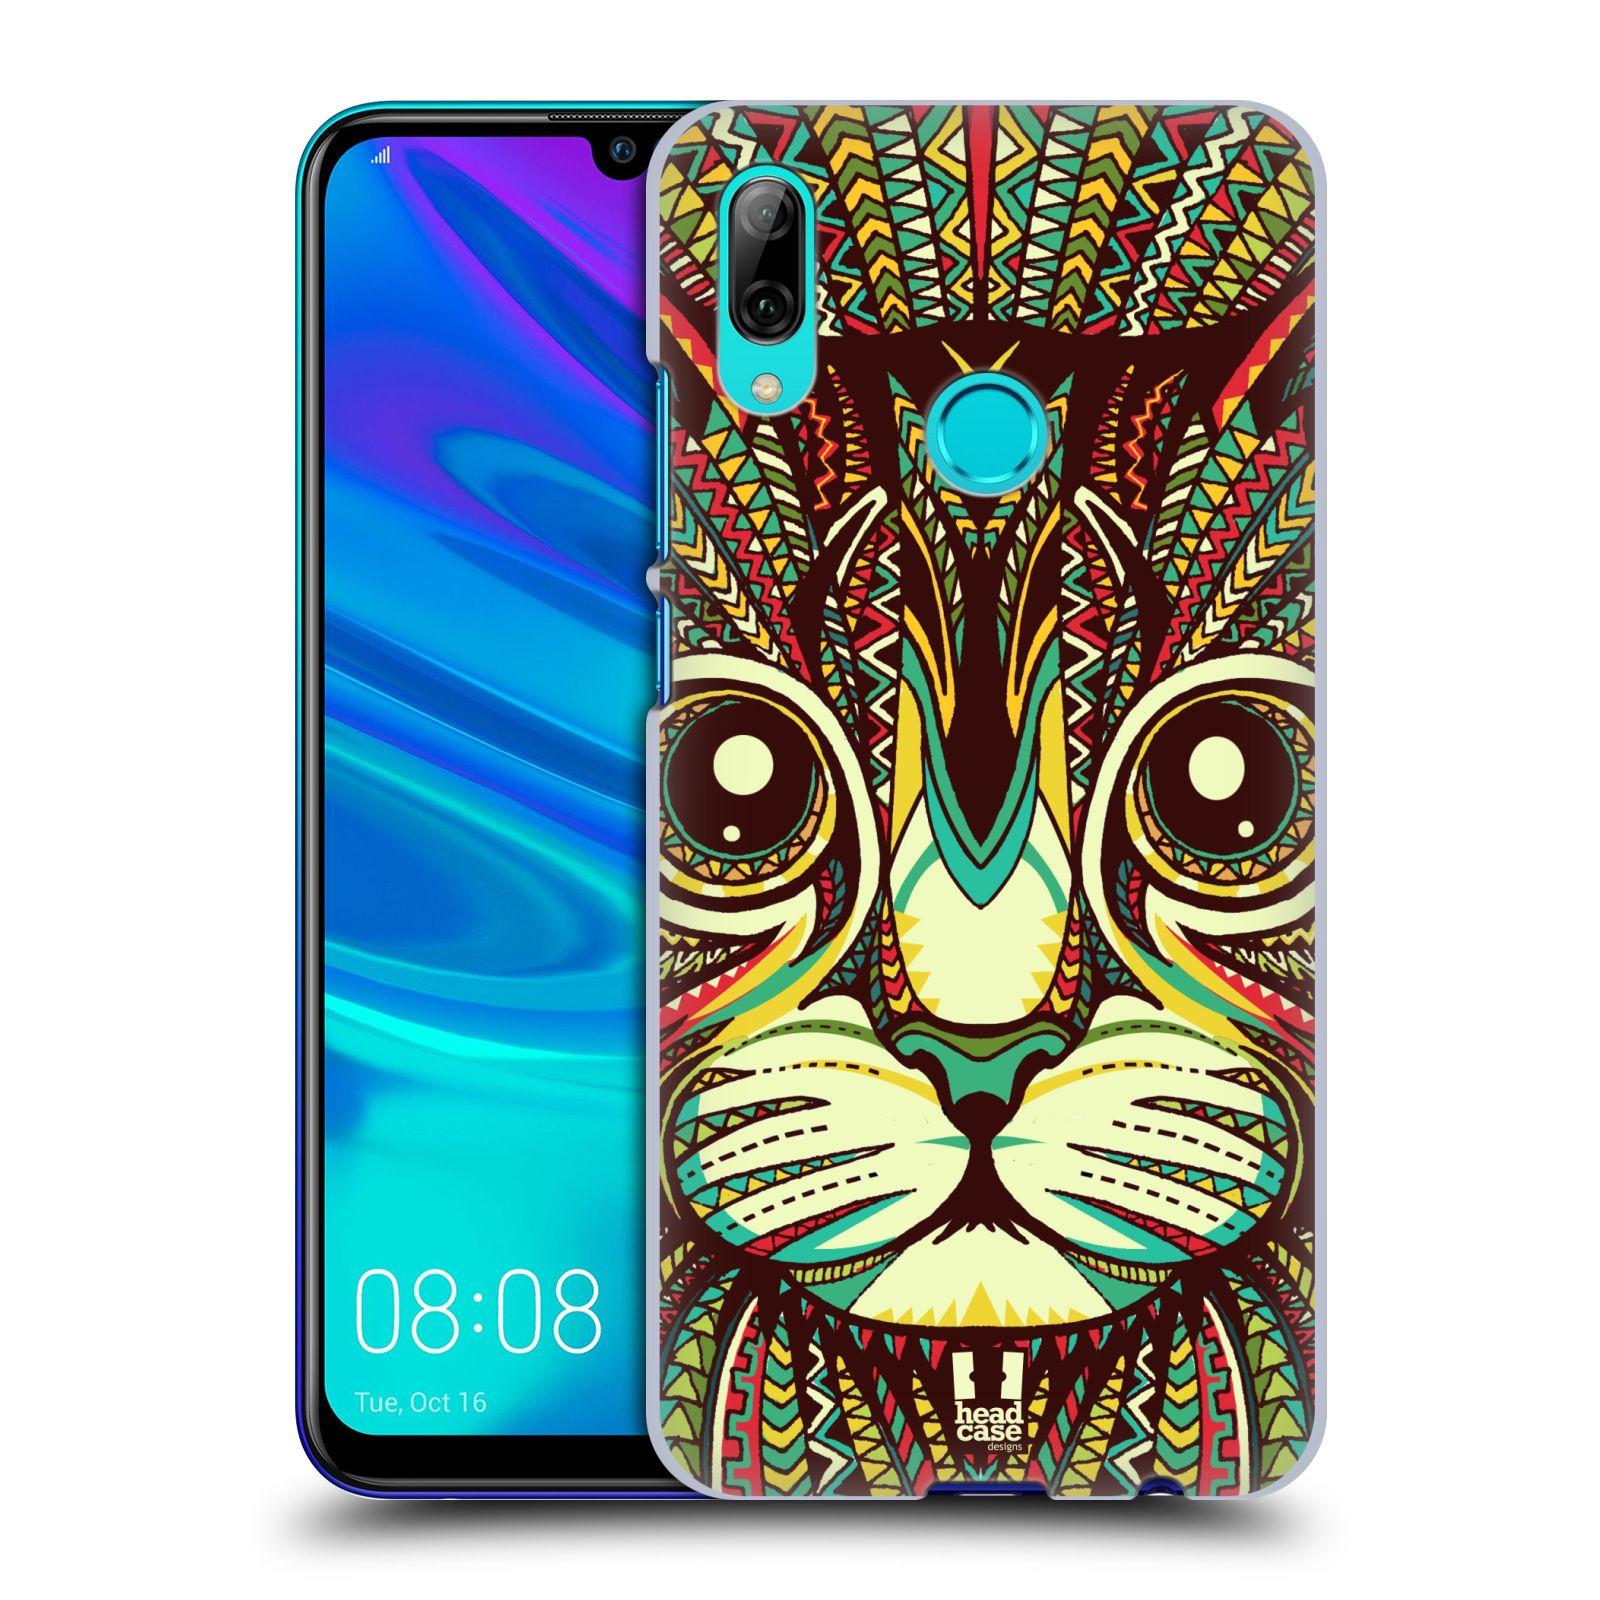 Plastové pouzdro na mobil Huawei P Smart (2019) - Head Case - AZTEC KOČKA